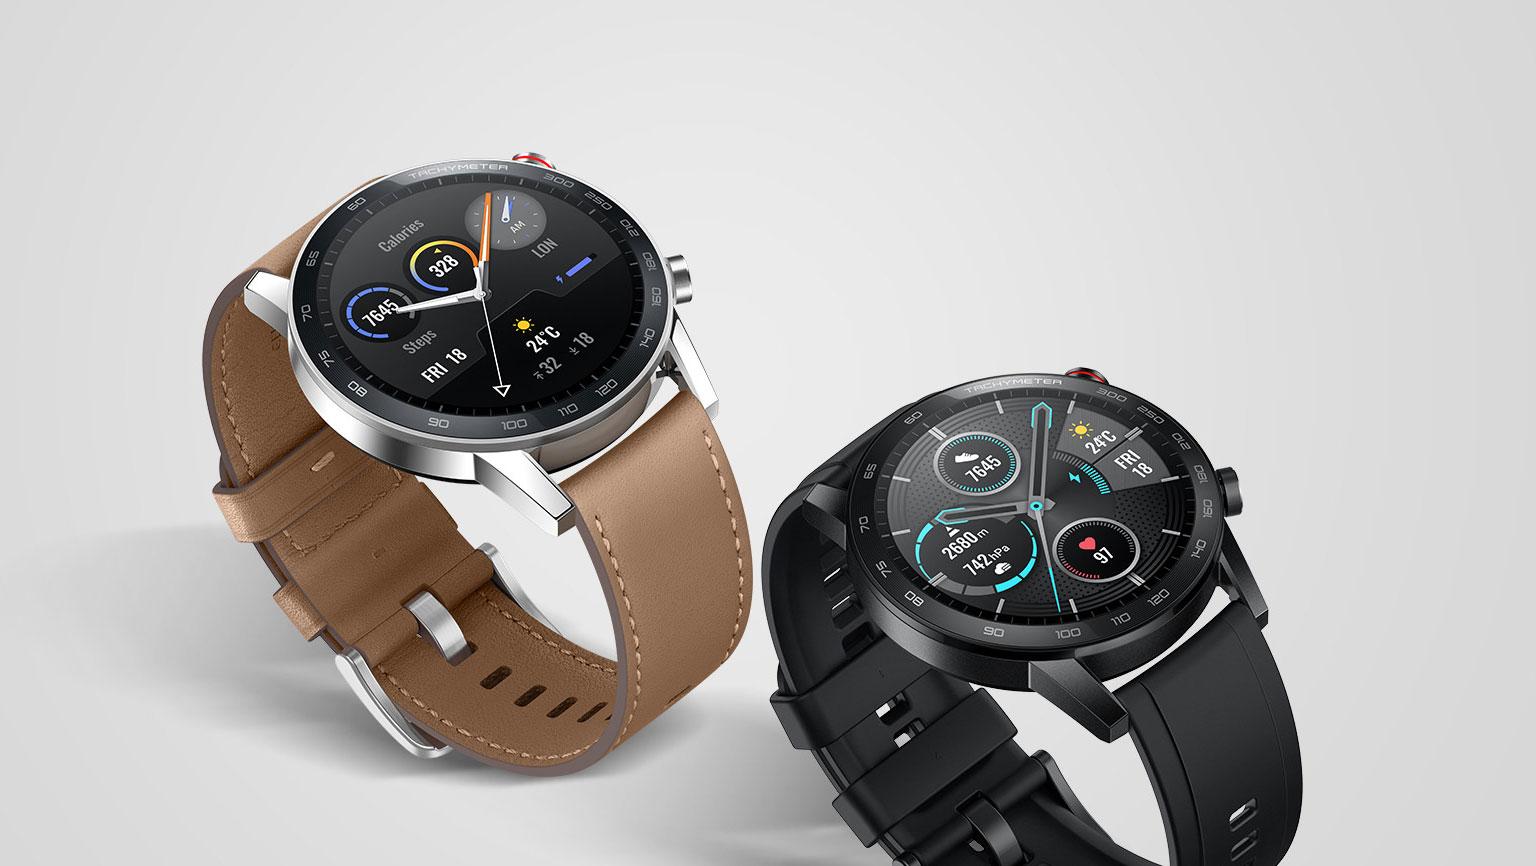 خرید ساعت هوشمند آنر HONOR Magic Watch 2